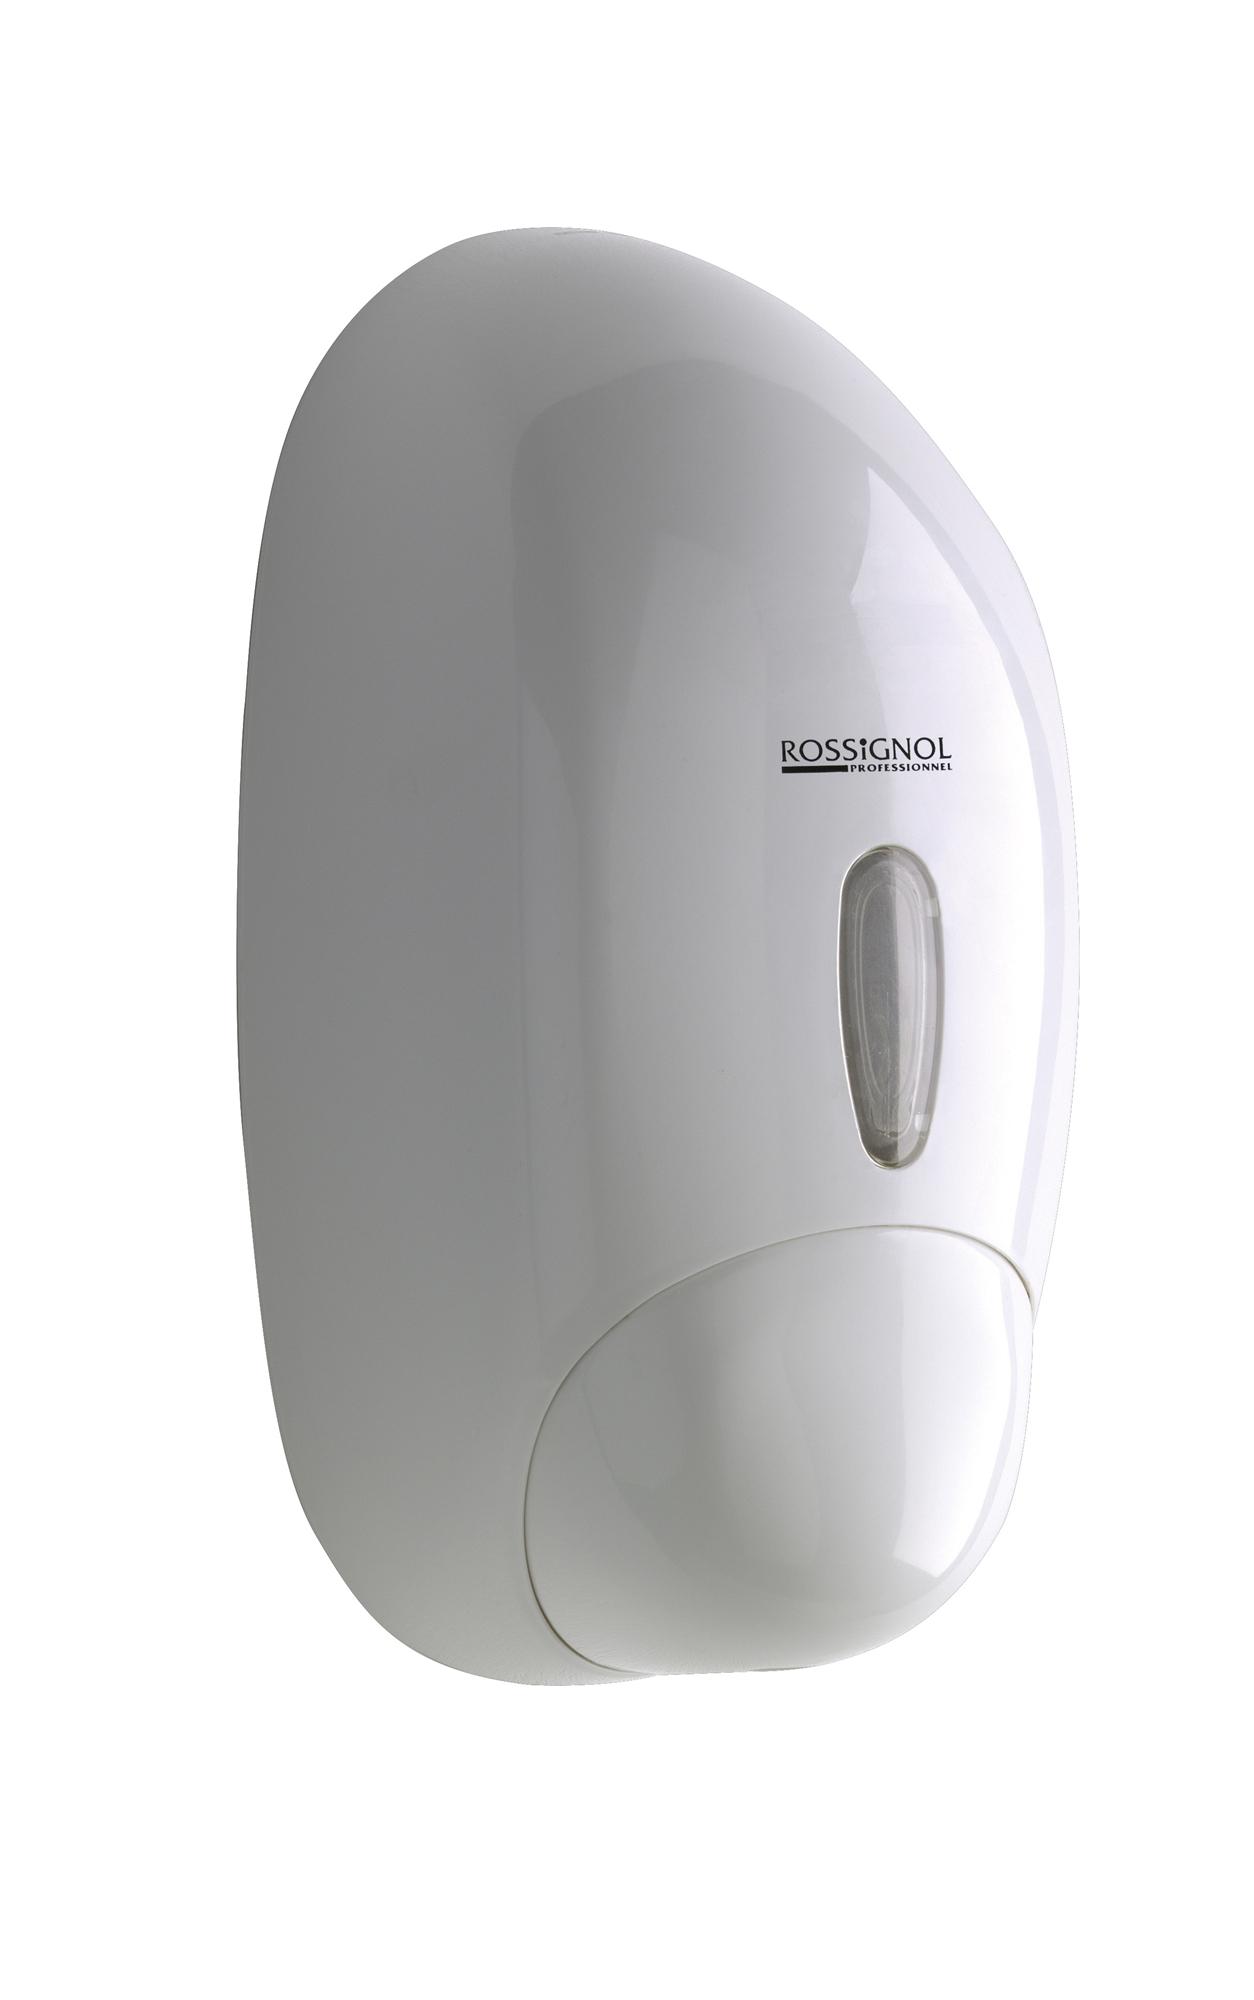 distributeur savon 1l rossignol lensea abs. Black Bedroom Furniture Sets. Home Design Ideas